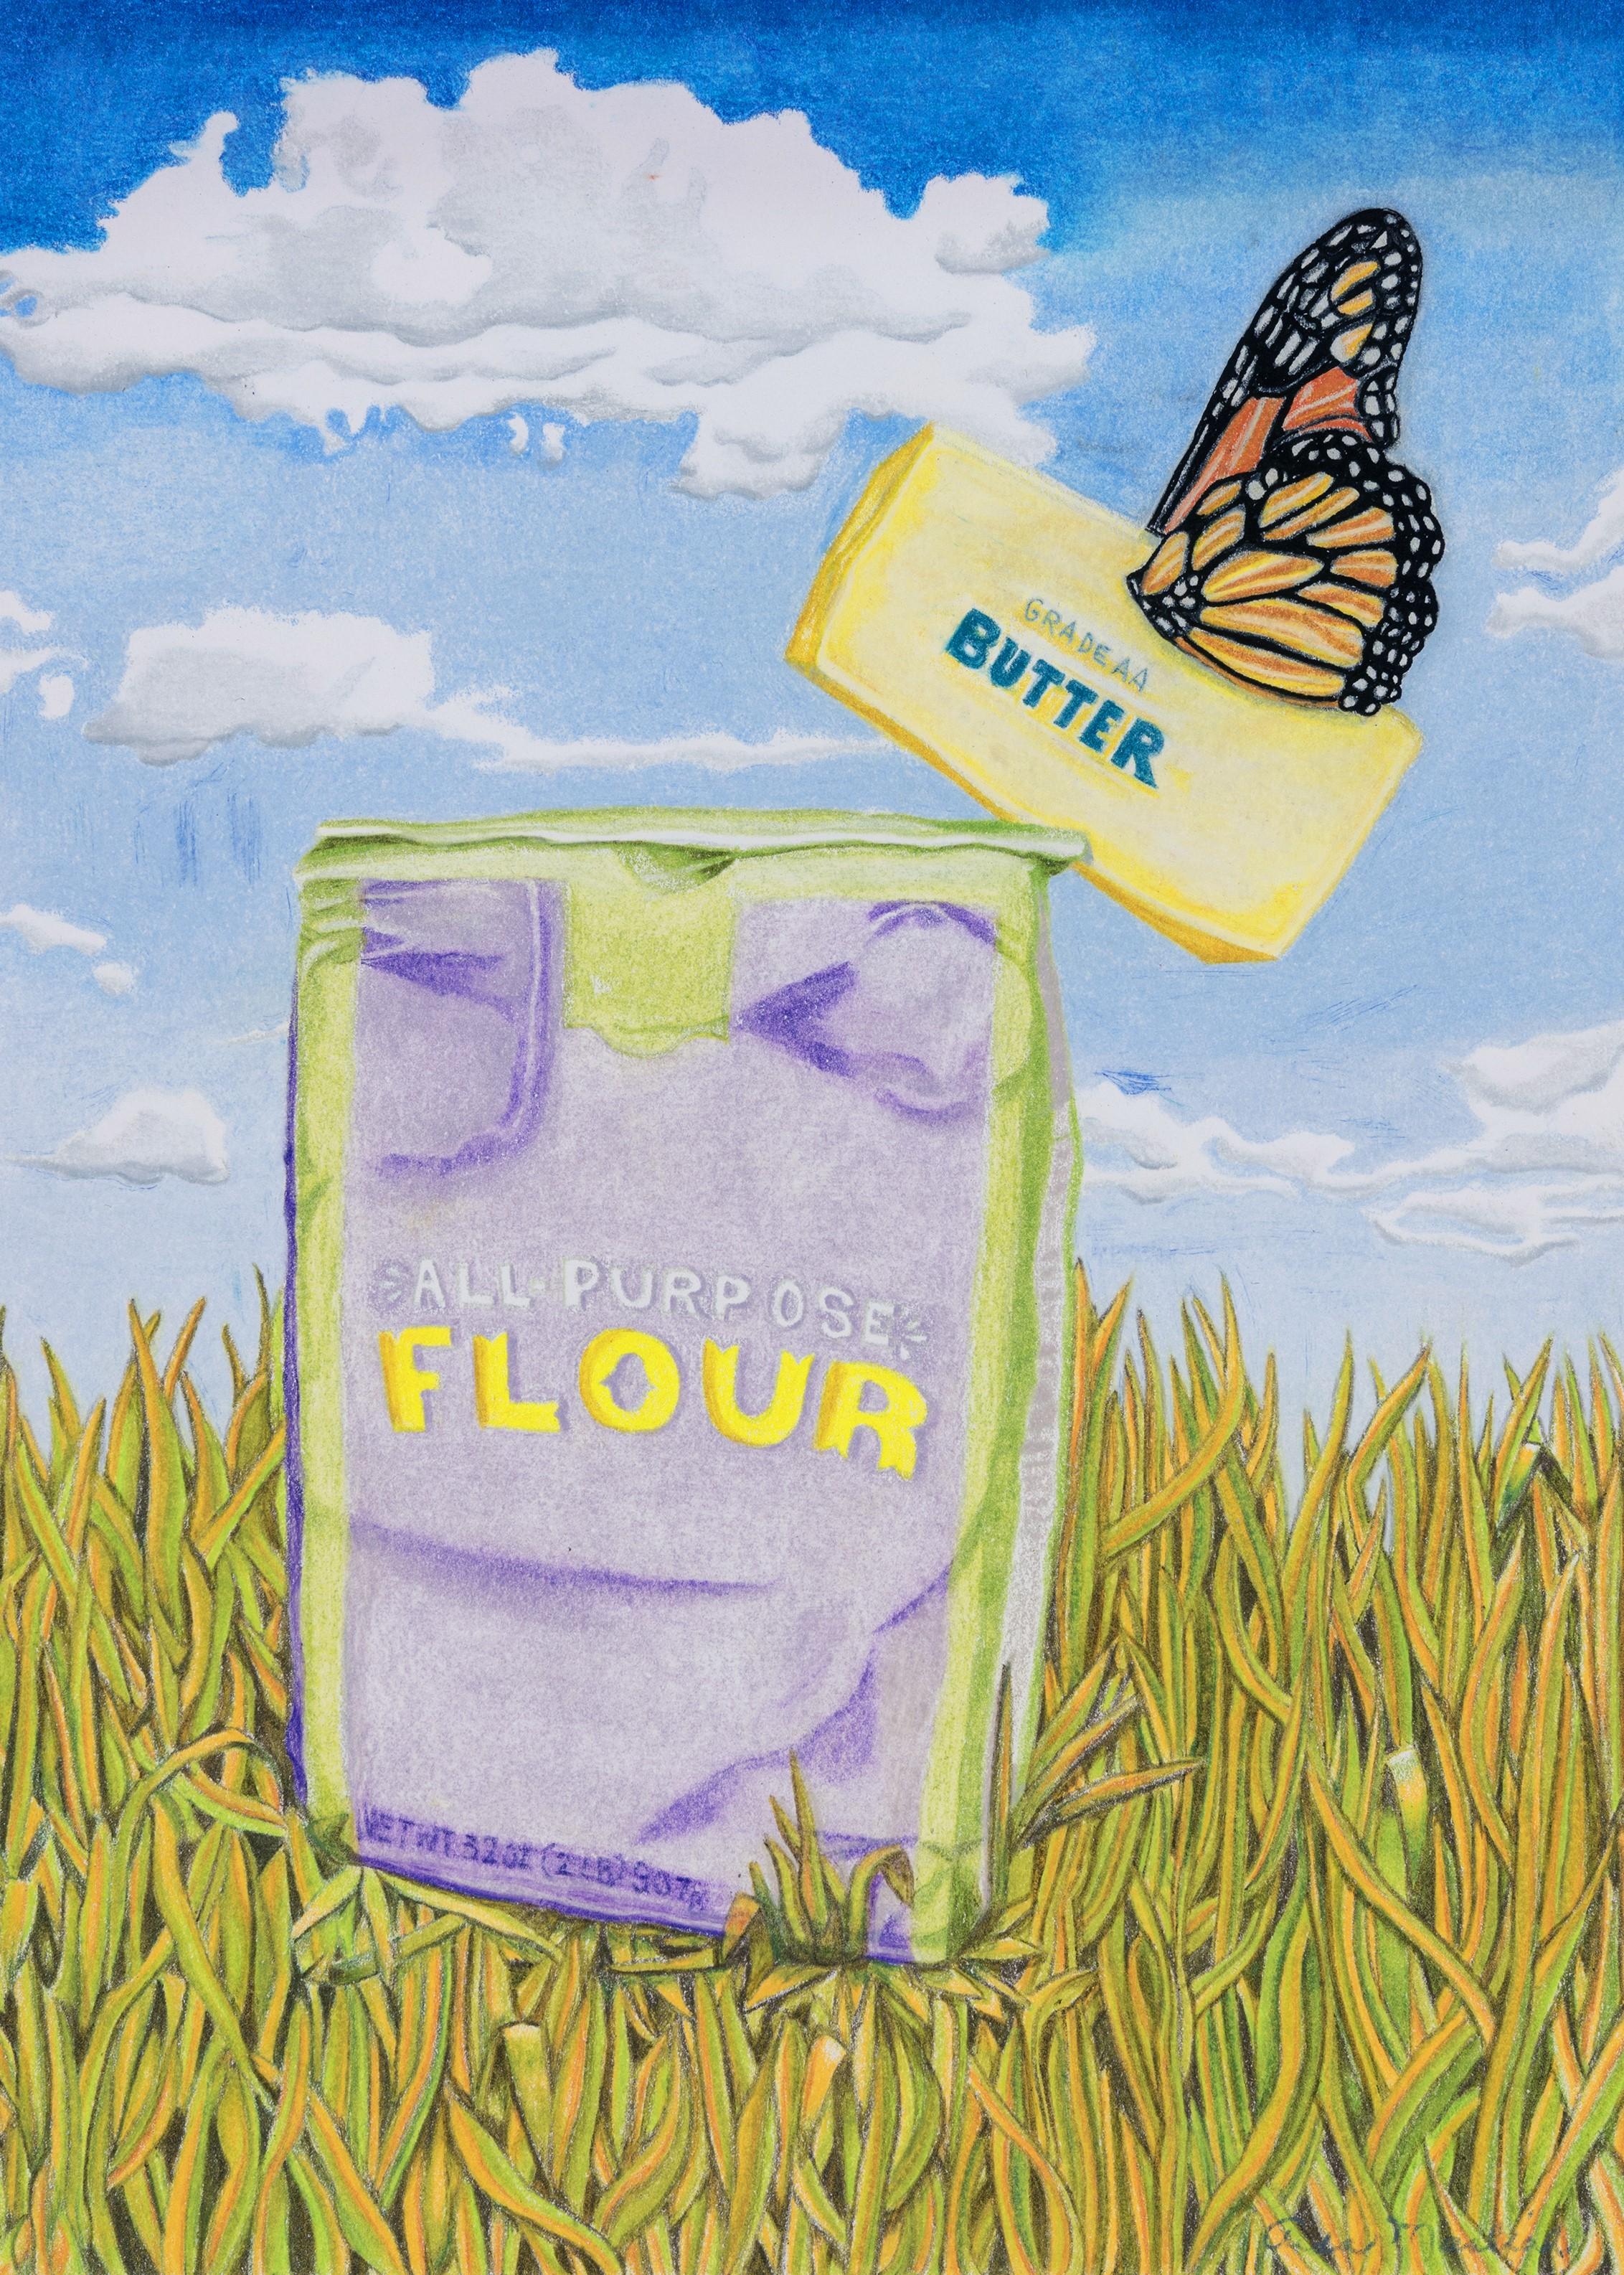 Butter Fly on Flour- Masliah